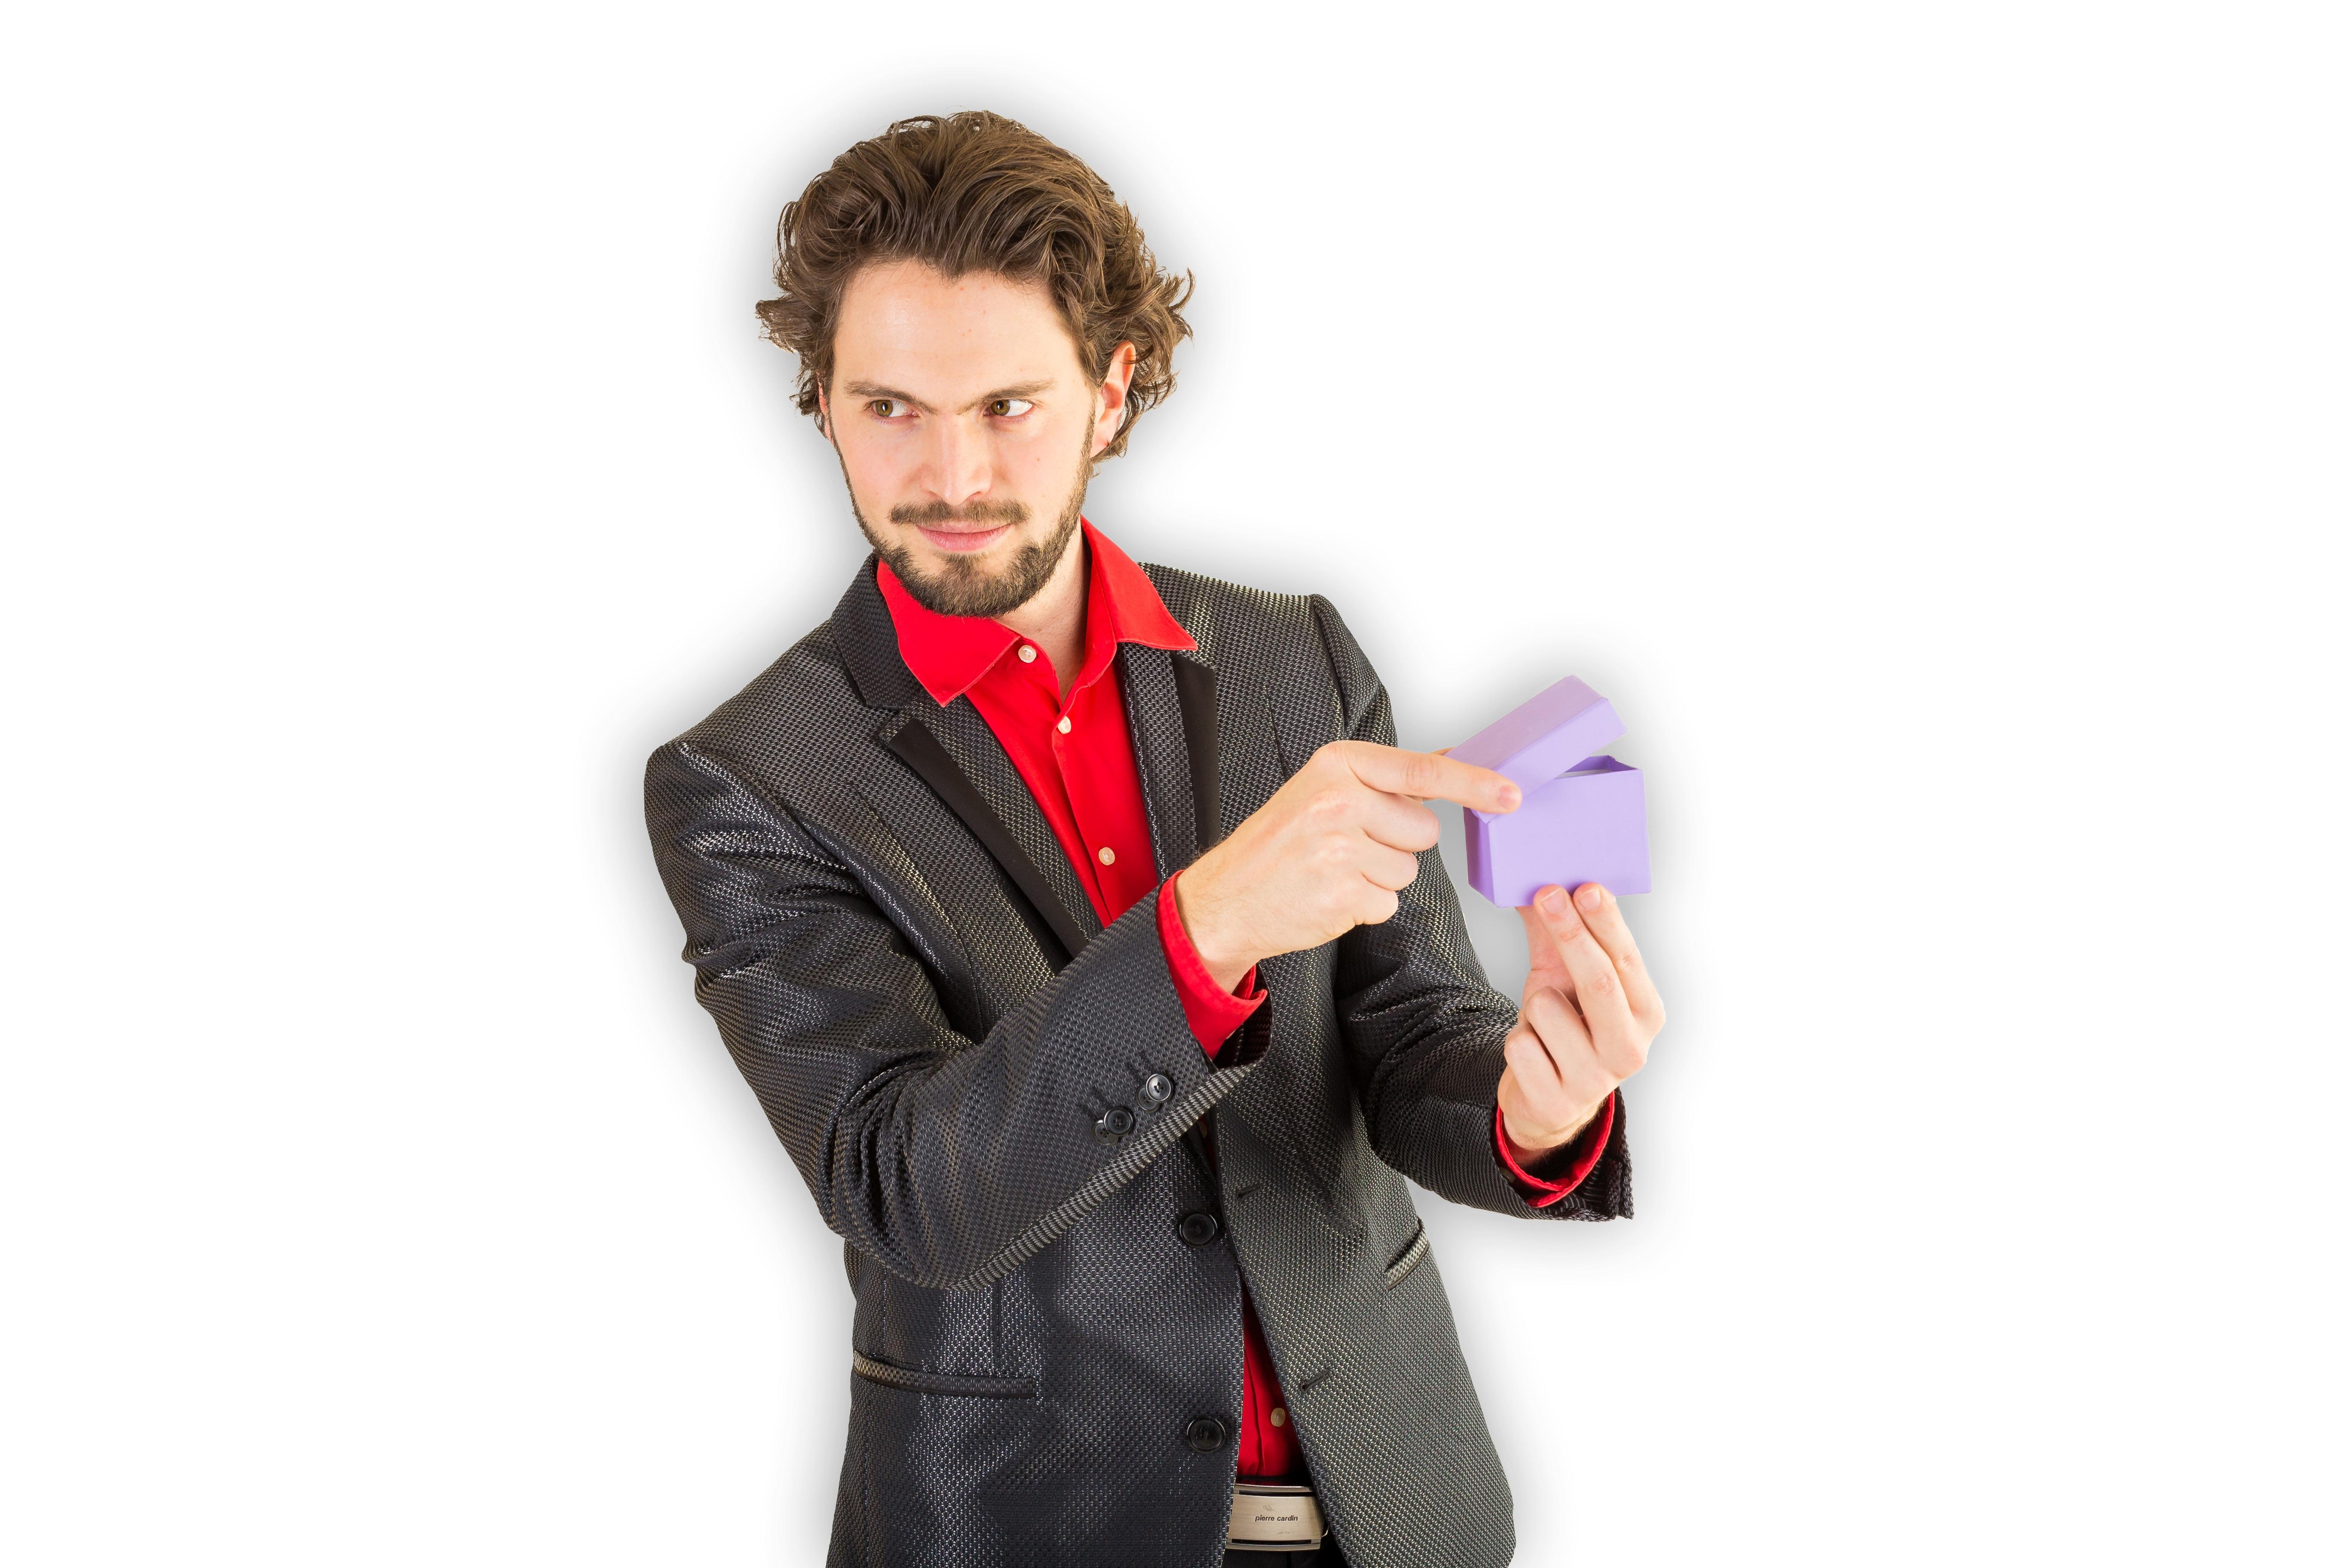 Zauberkünstler Maguel